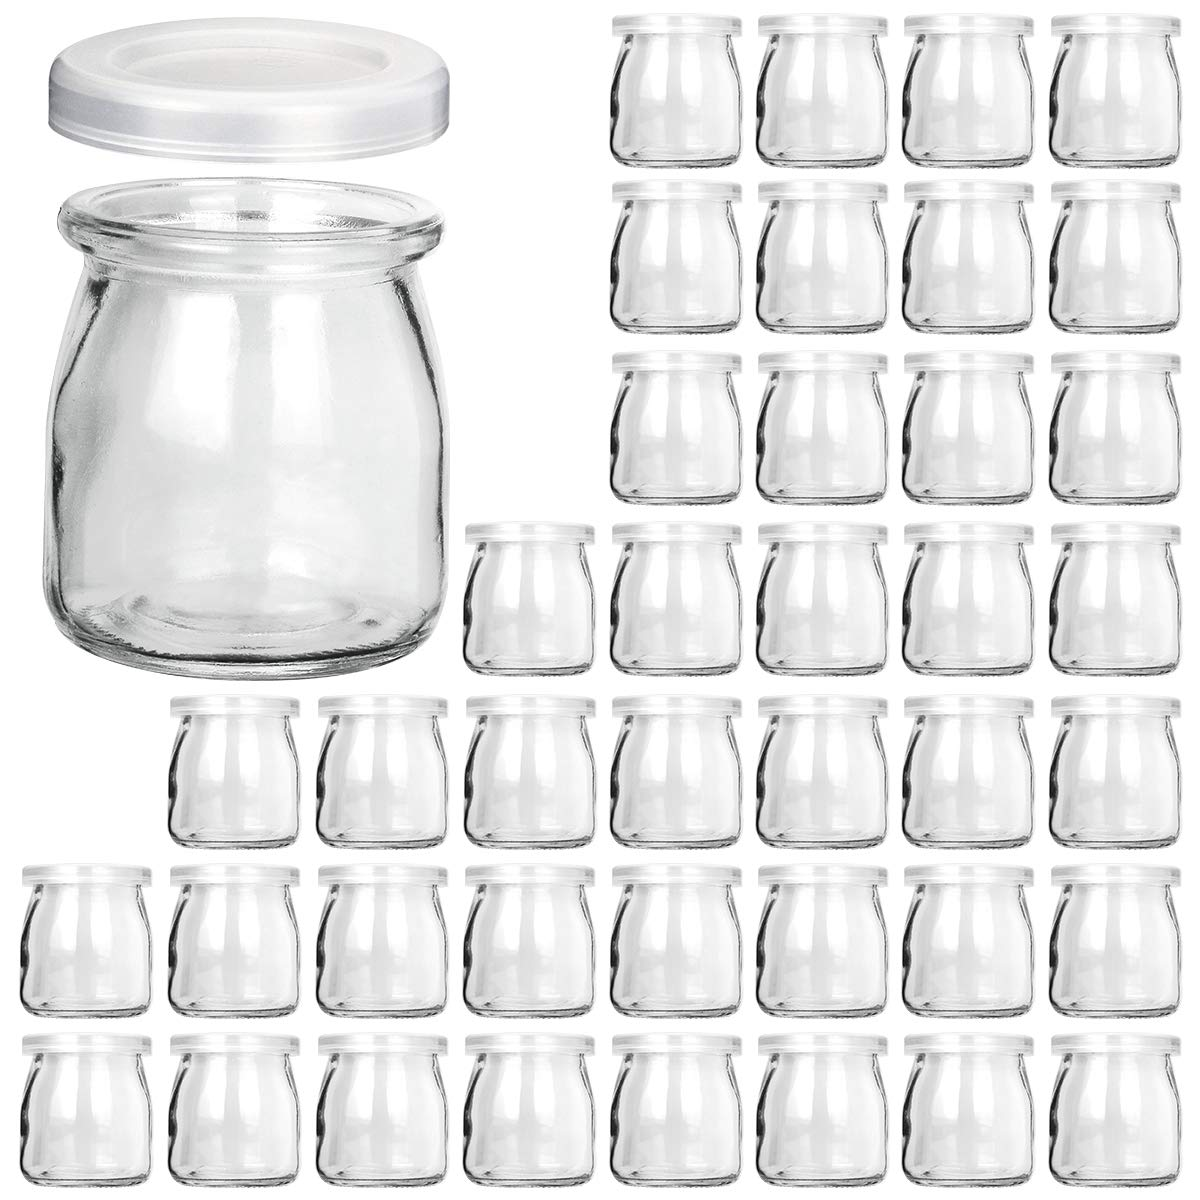 Glass Jars, KAMOTA 40 PACK 6oz Clear Yogurt Jars With PE Lids, Glass Pudding Jars Yogurt Jars Ideal for Jam, Honey, Wedding Favors, Shower Favors, Baby Foods (200ml)